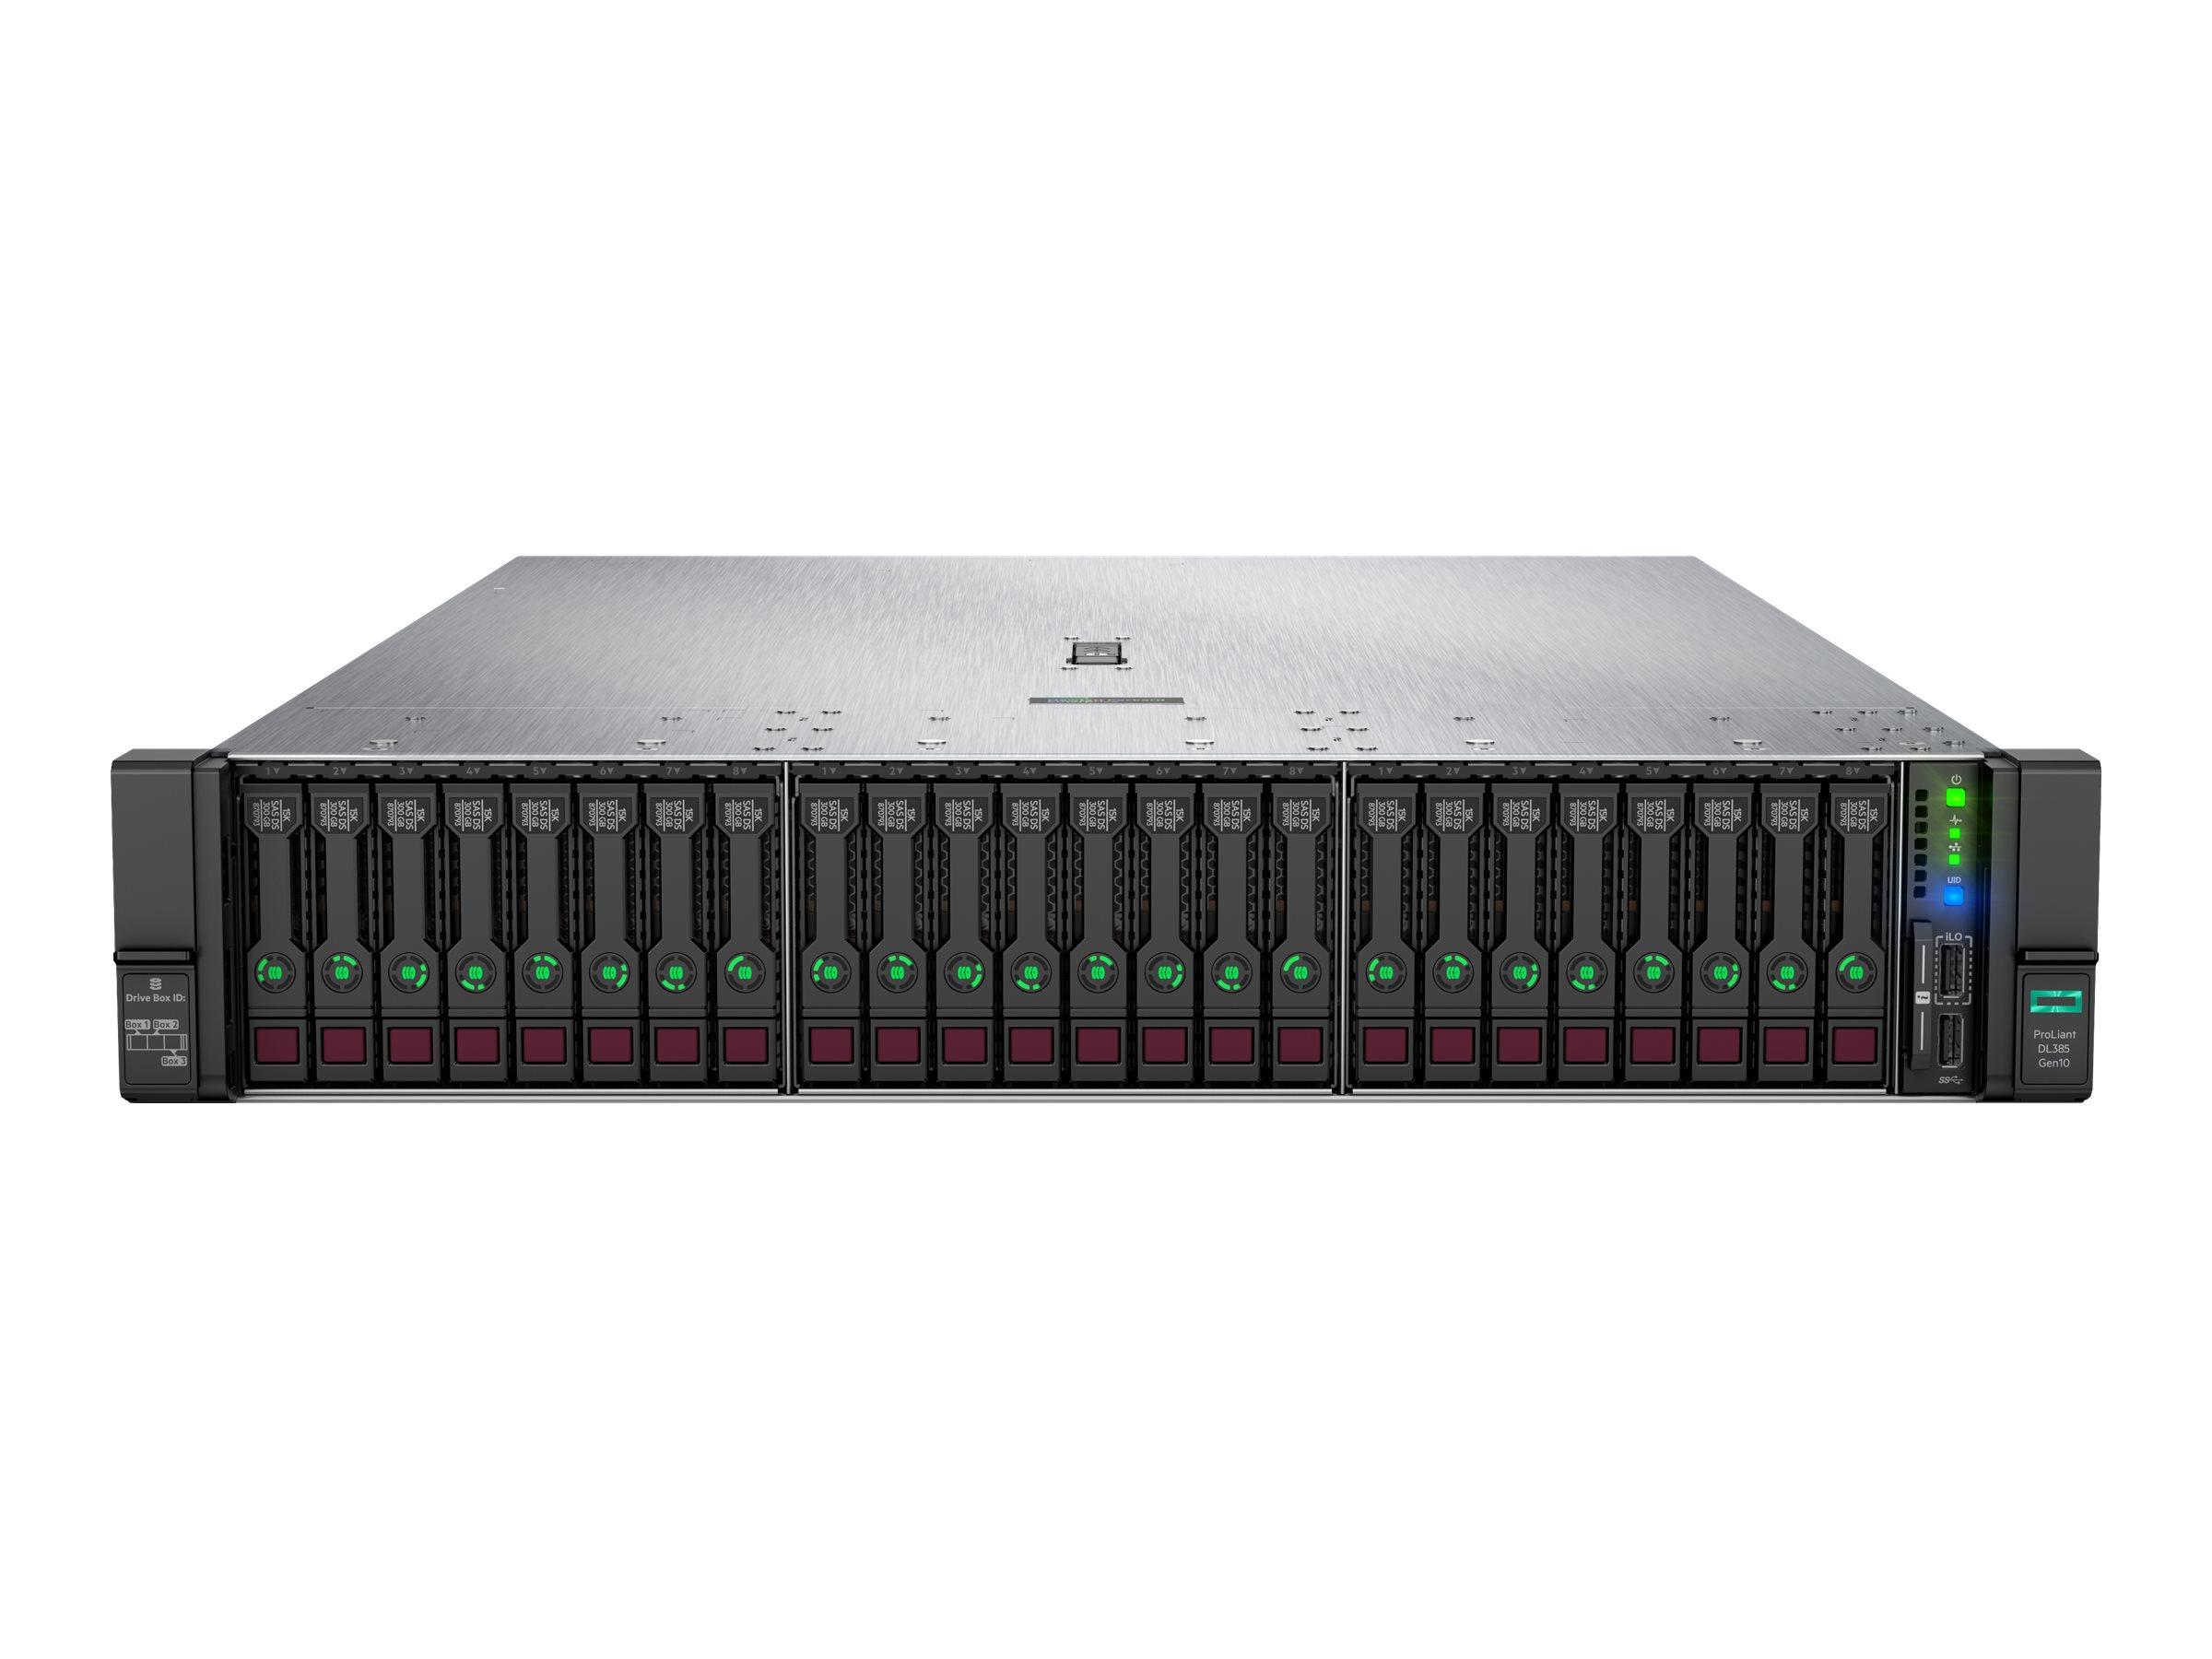 HPE ProLiant DL385 Gen10 Rack Server 2